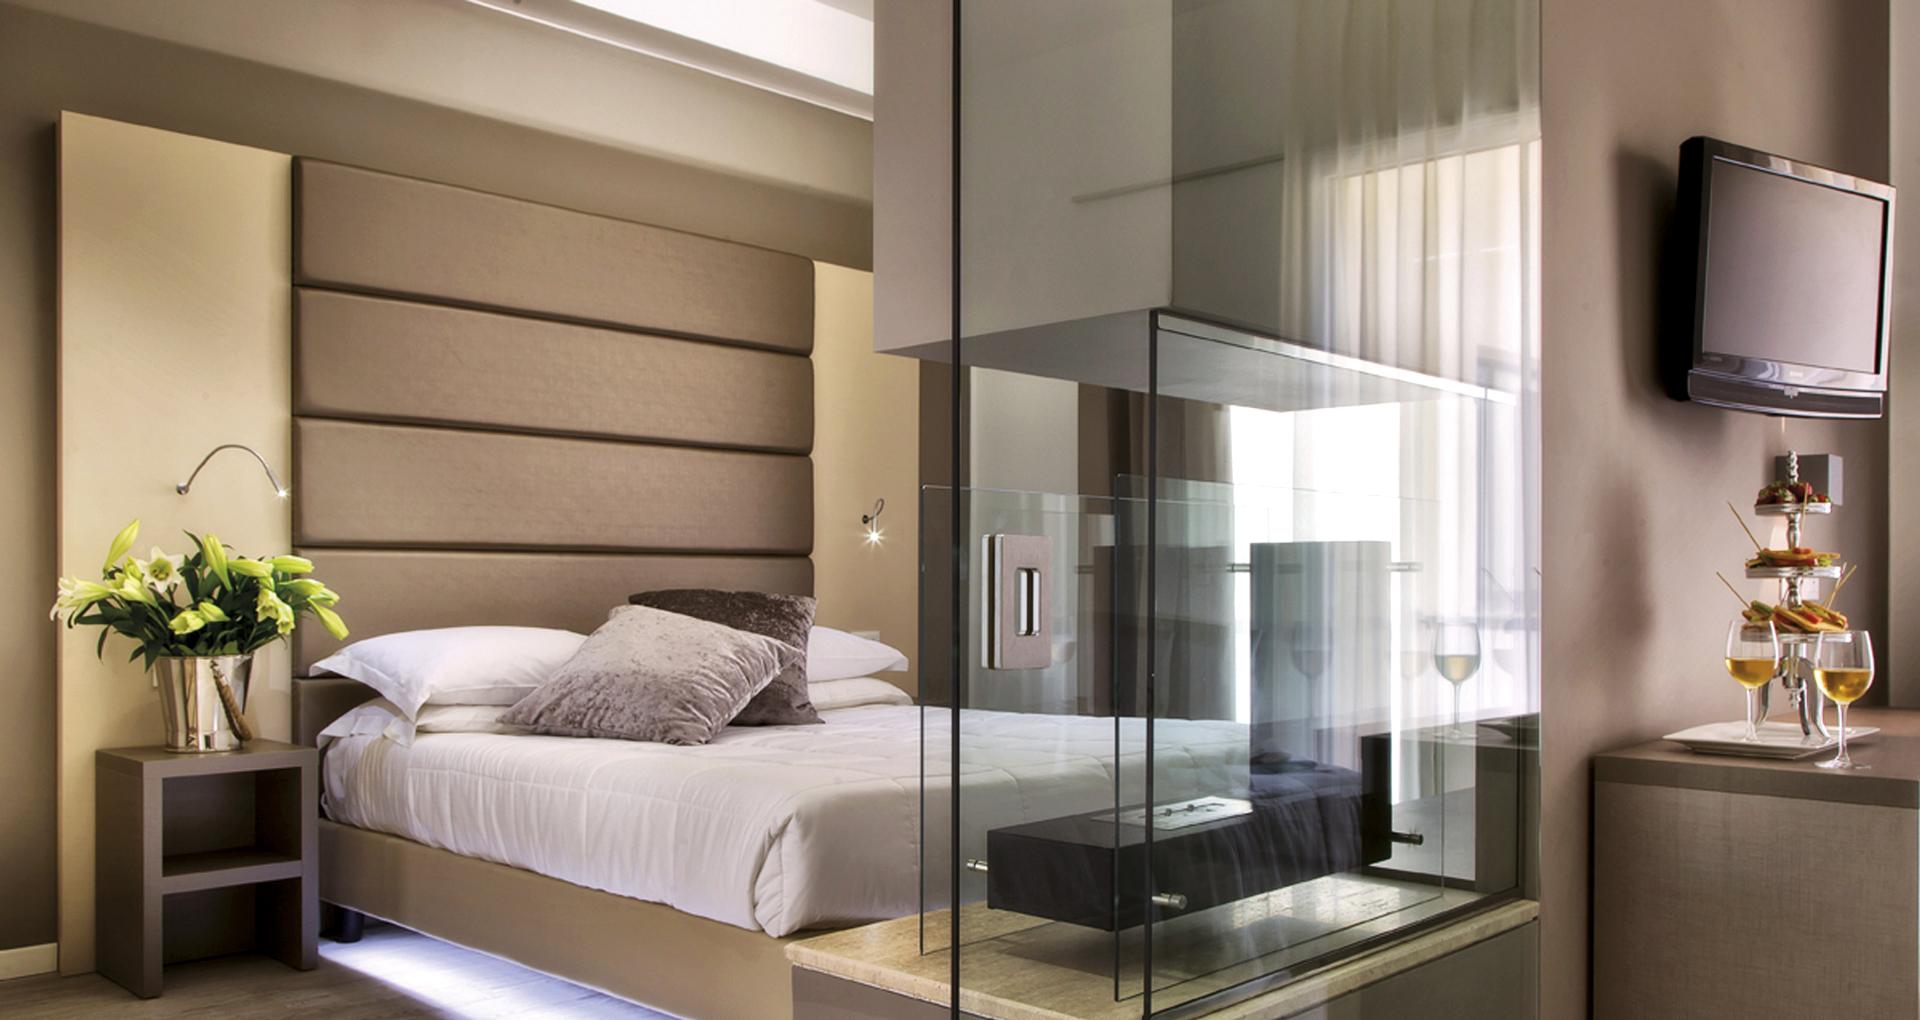 hf arredo contract arredamento hotel